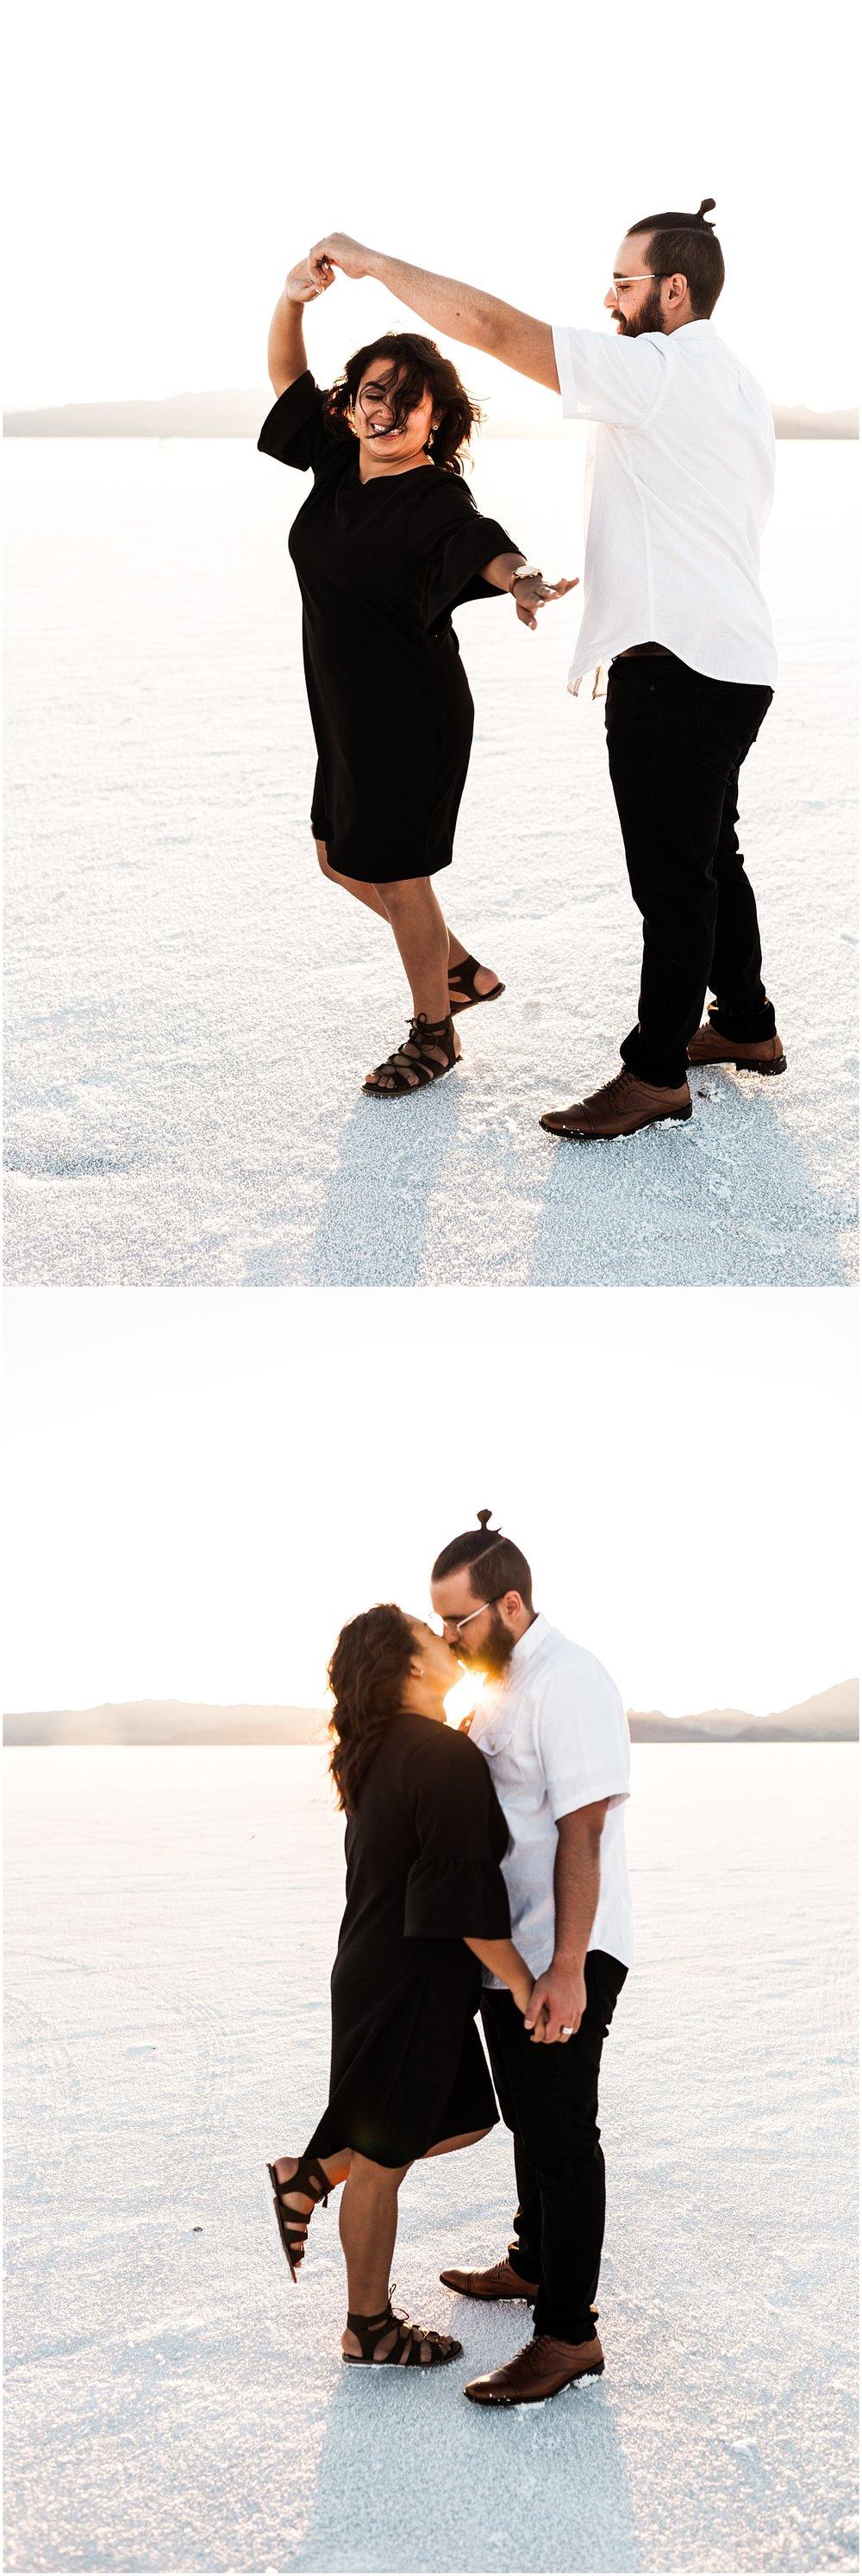 Rachel Reyes Photography-Lupita & Gabe Engagements (4).jpg